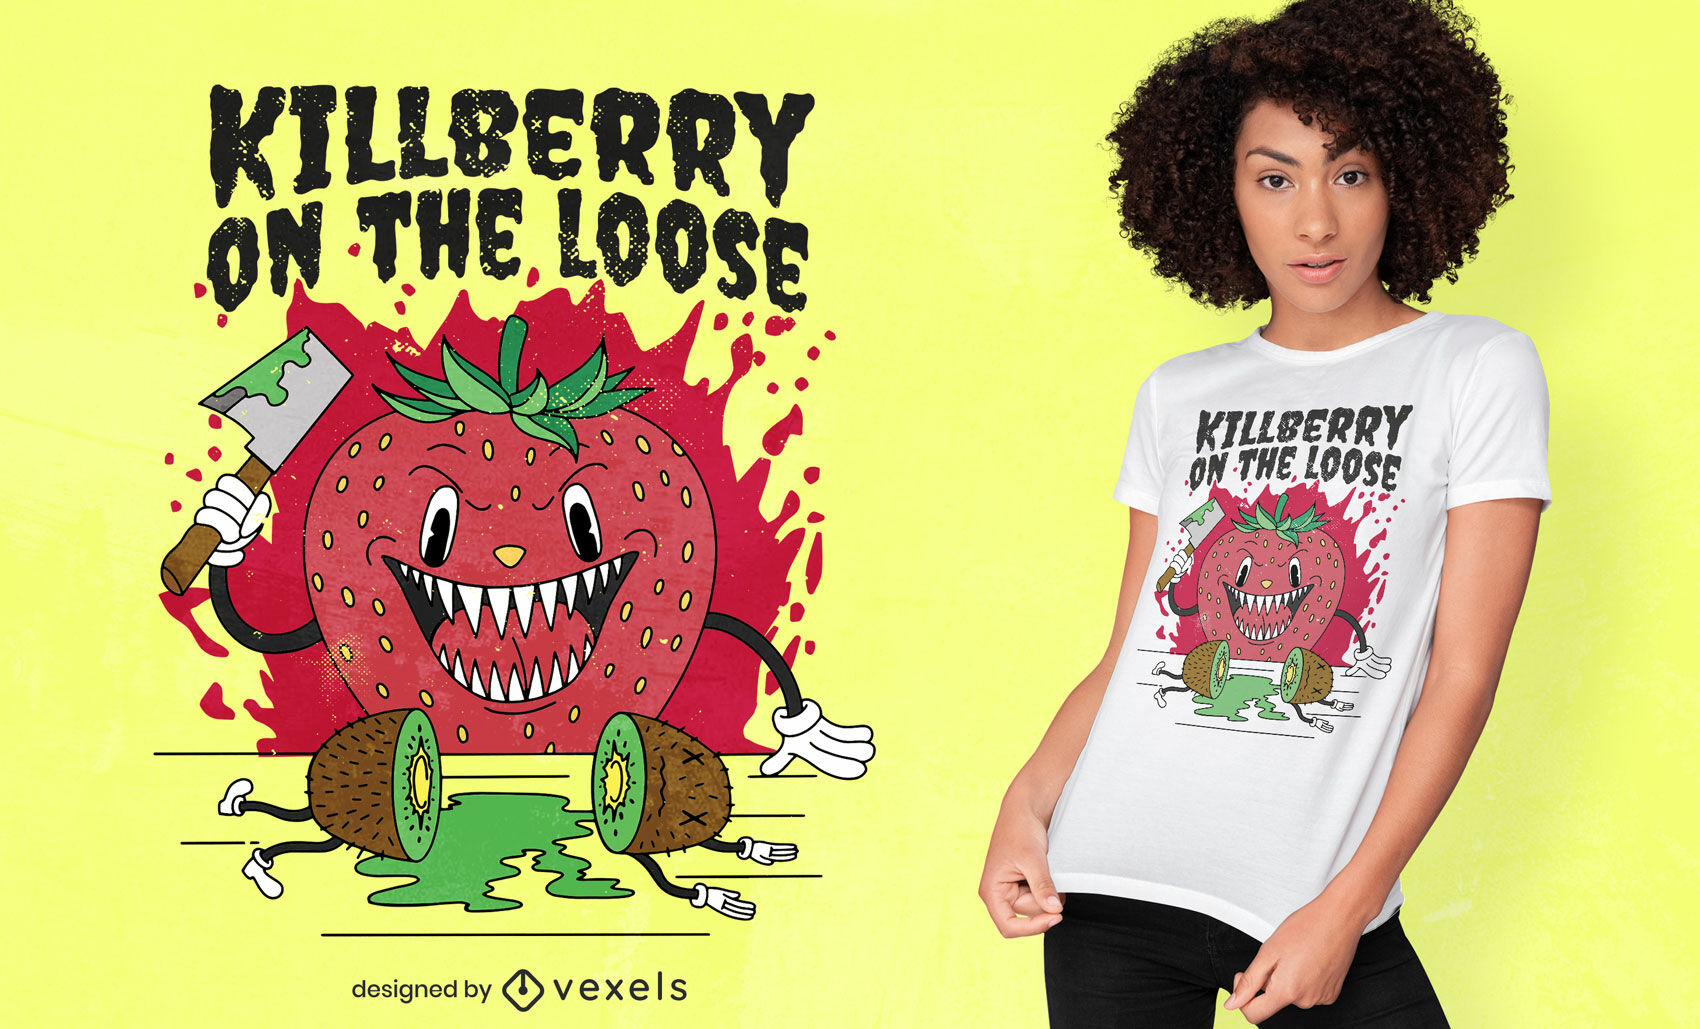 Killer strawberry with kiwi t-shirt design